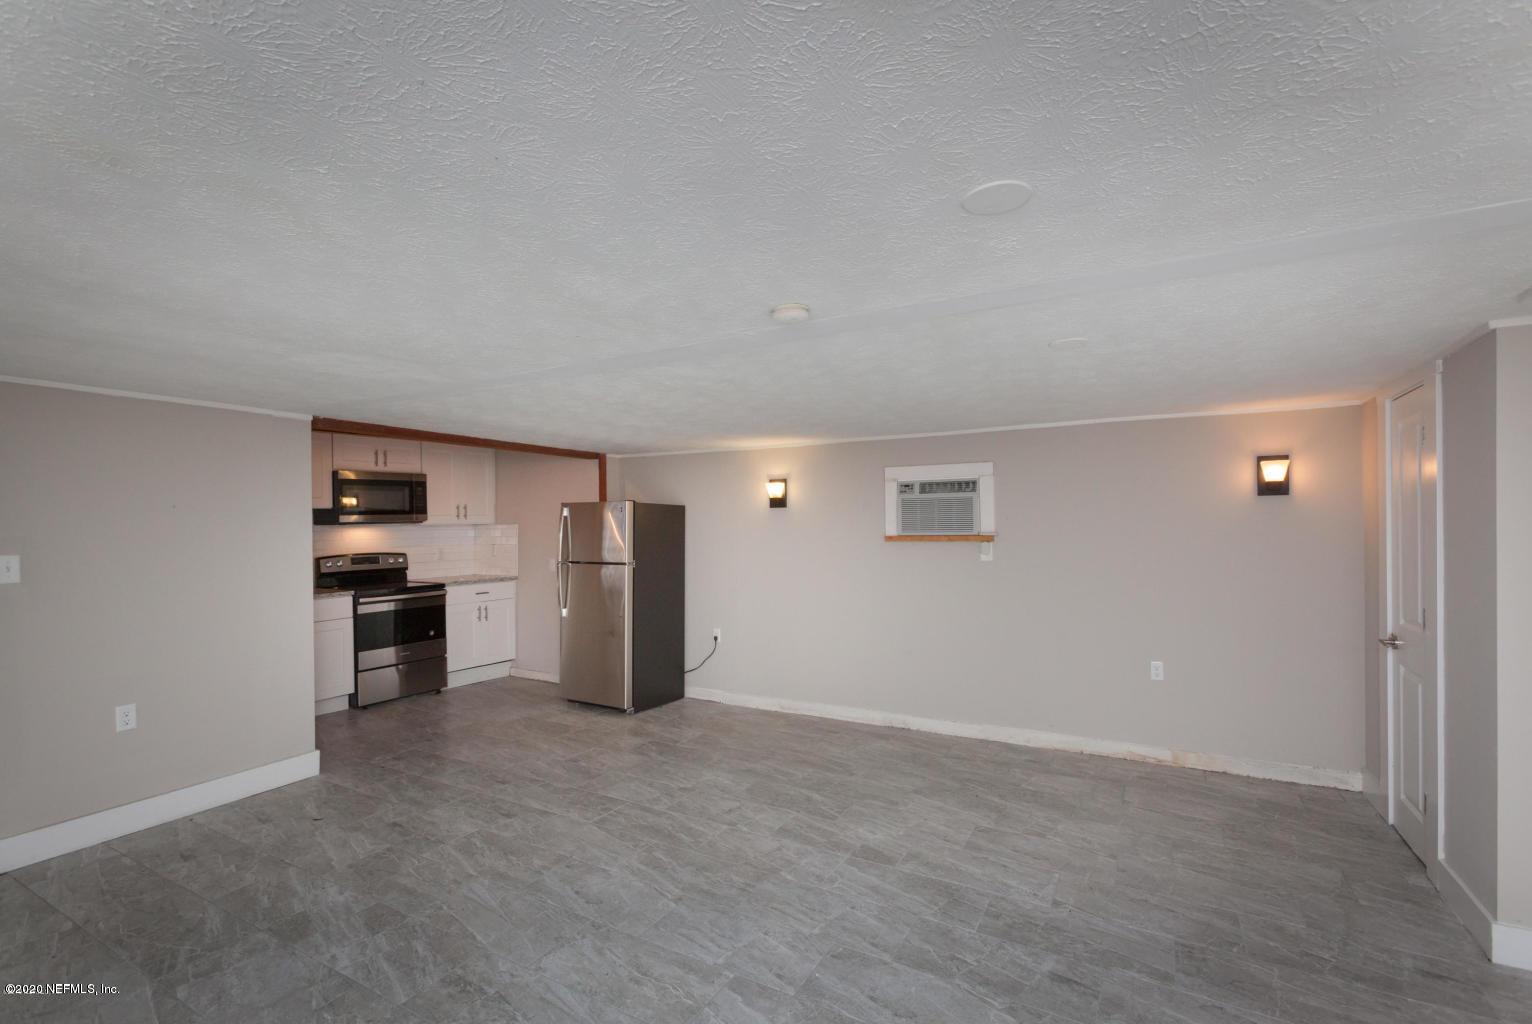 3643 BOONE PARK, JACKSONVILLE, FLORIDA 32205, 1 Bedroom Bedrooms, ,1 BathroomBathrooms,Rental,For Rent,BOONE PARK,1080923